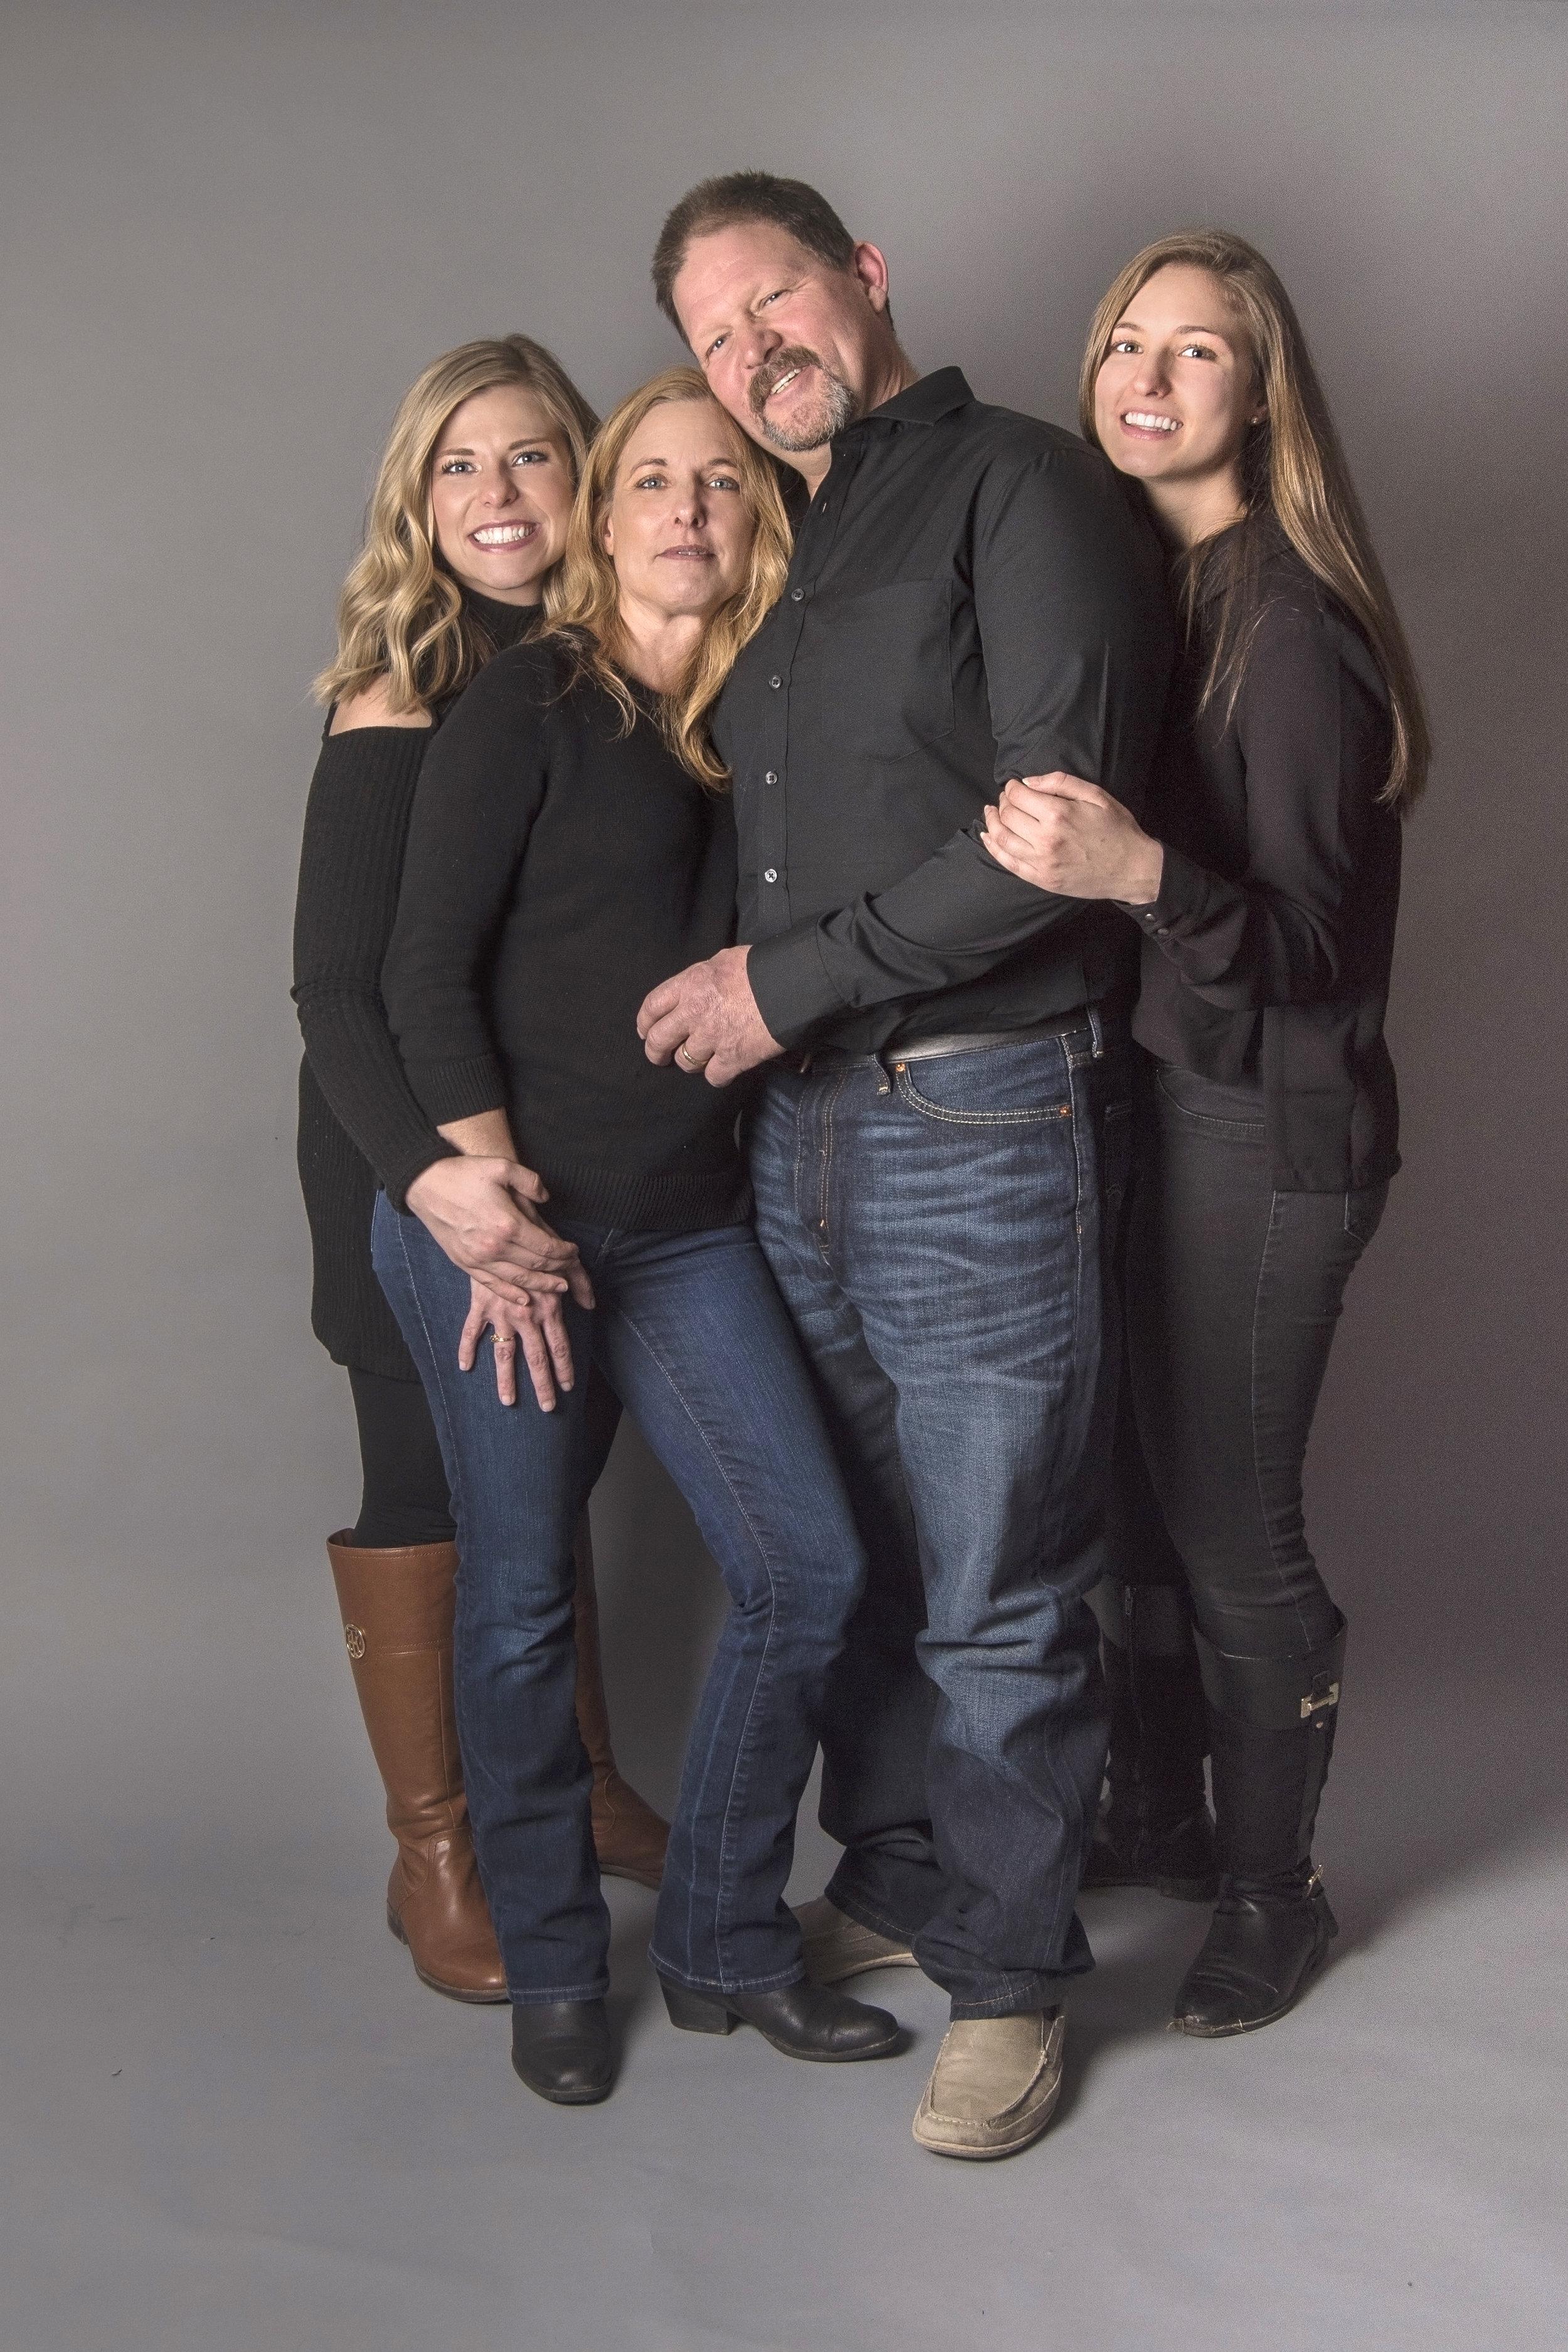 Indoor Family Photo